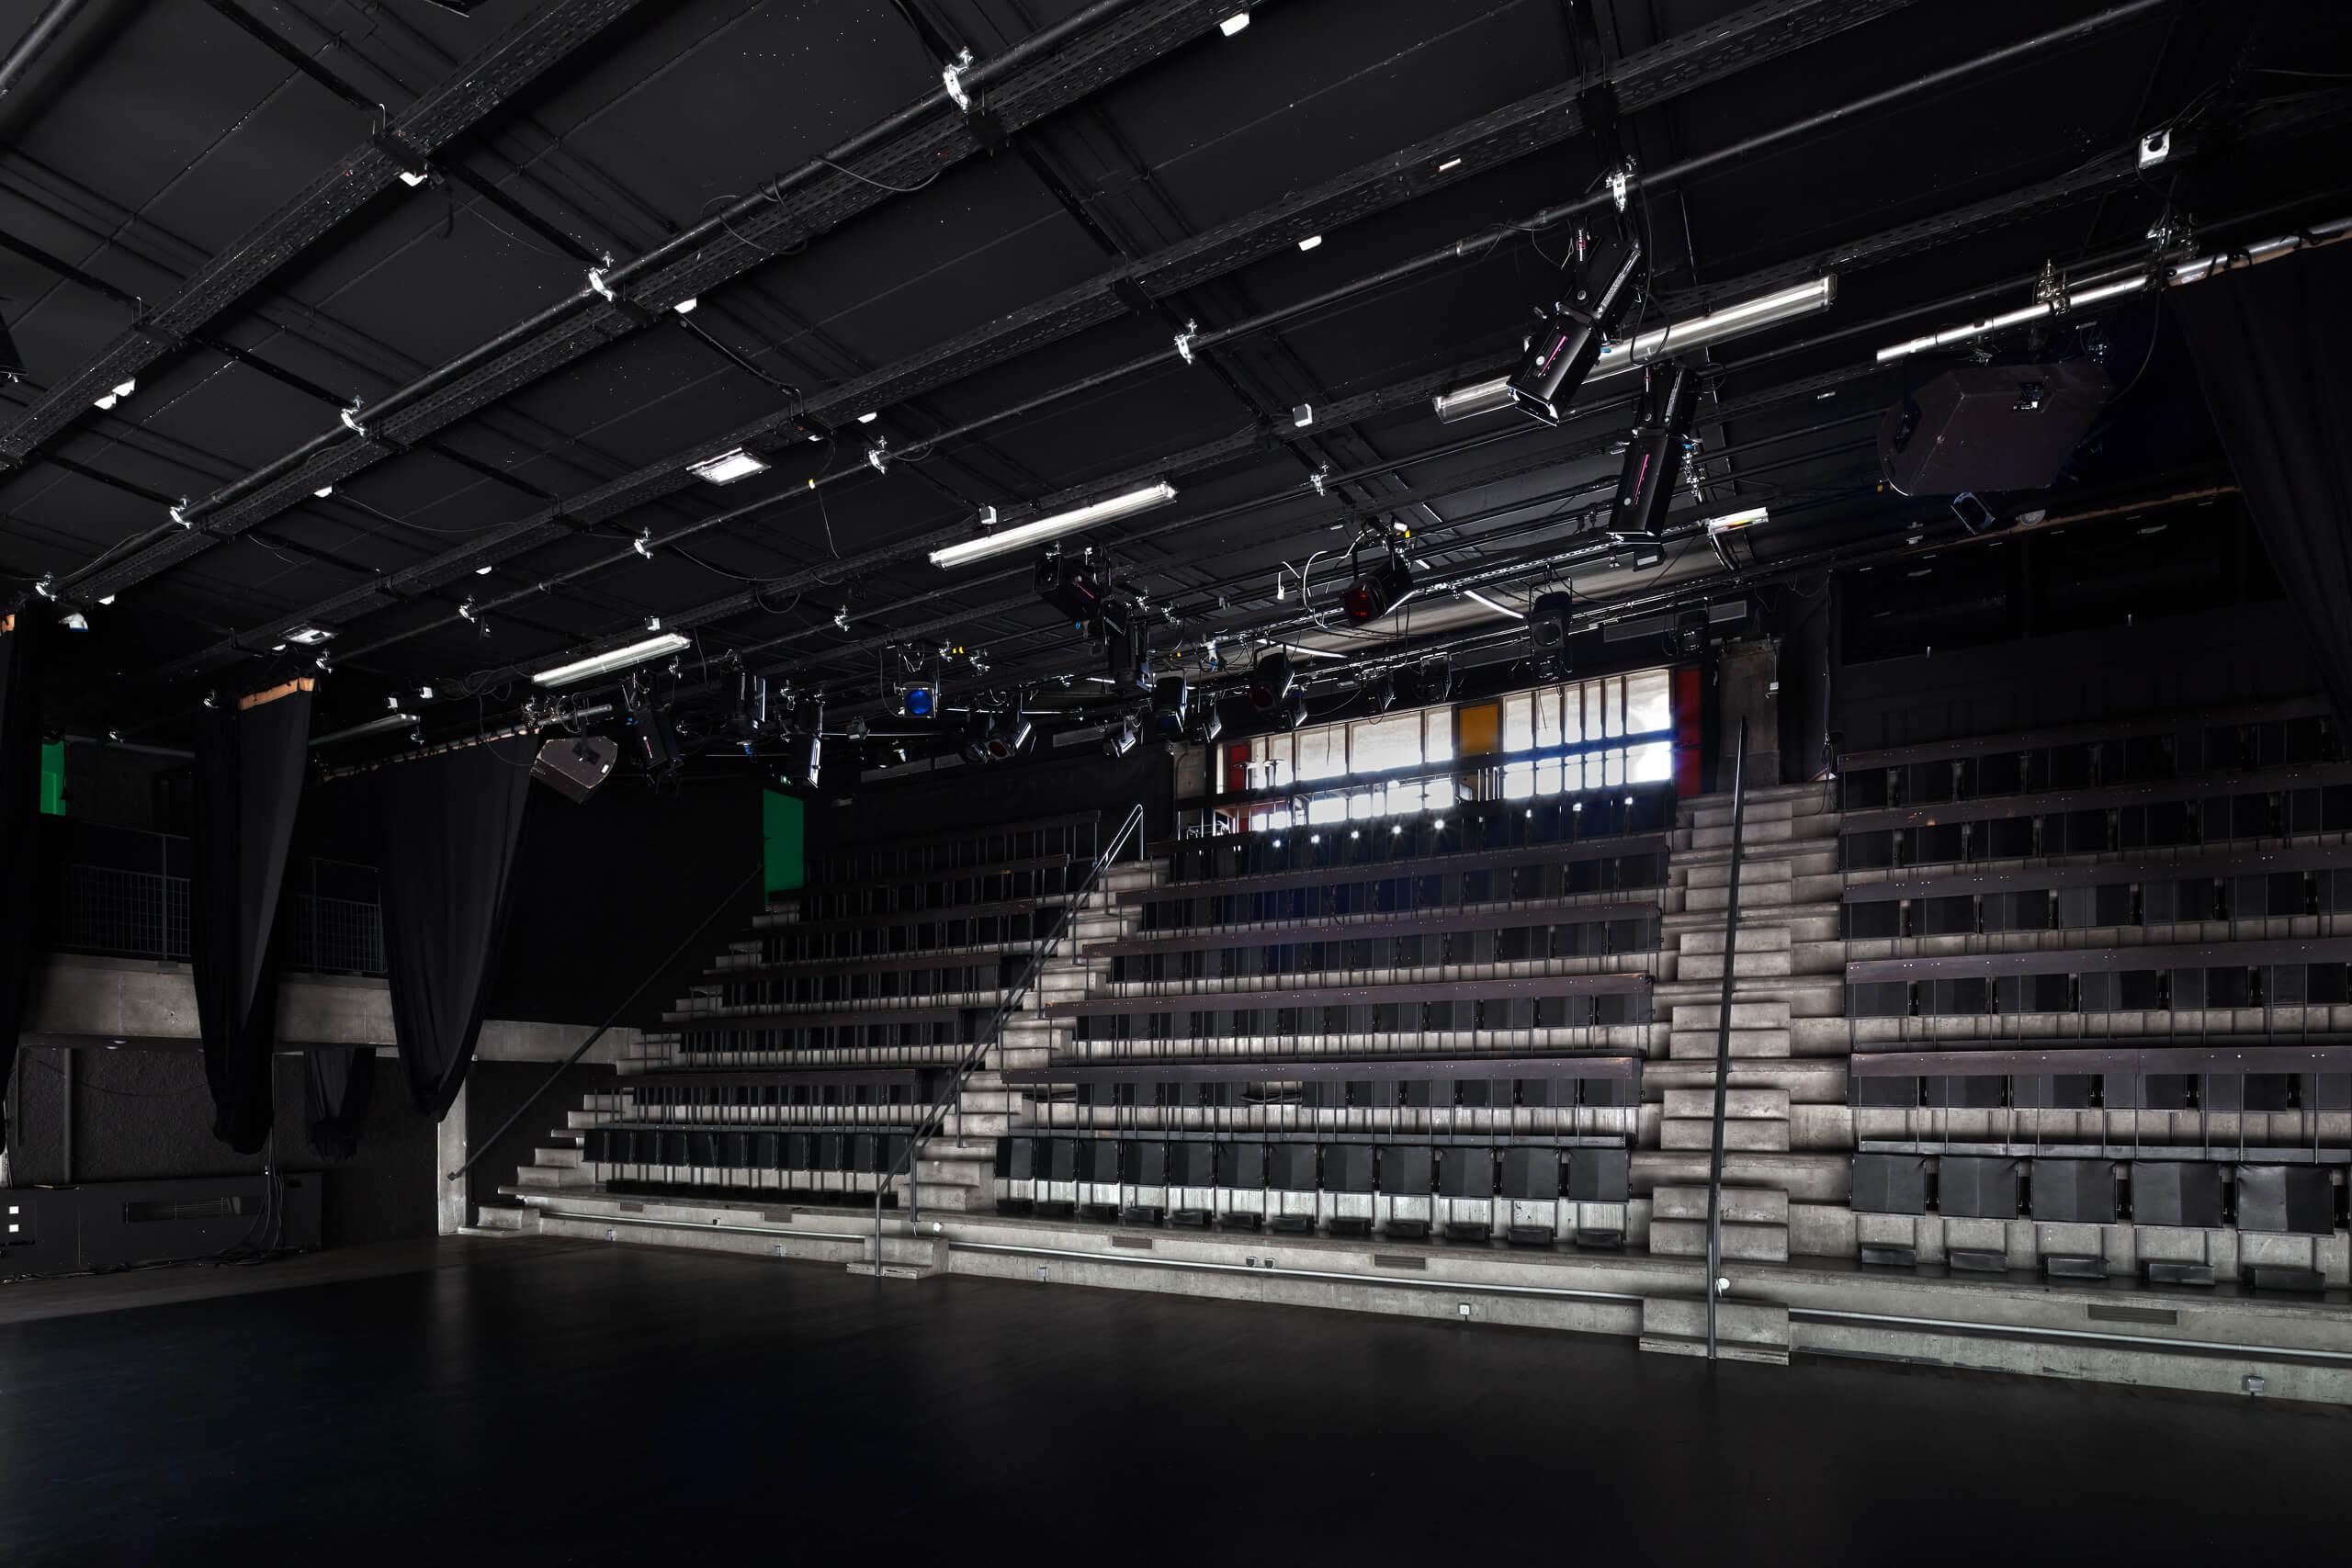 Federico_Covre_Le_Corbusier_Stadium_Firminy_2018_17